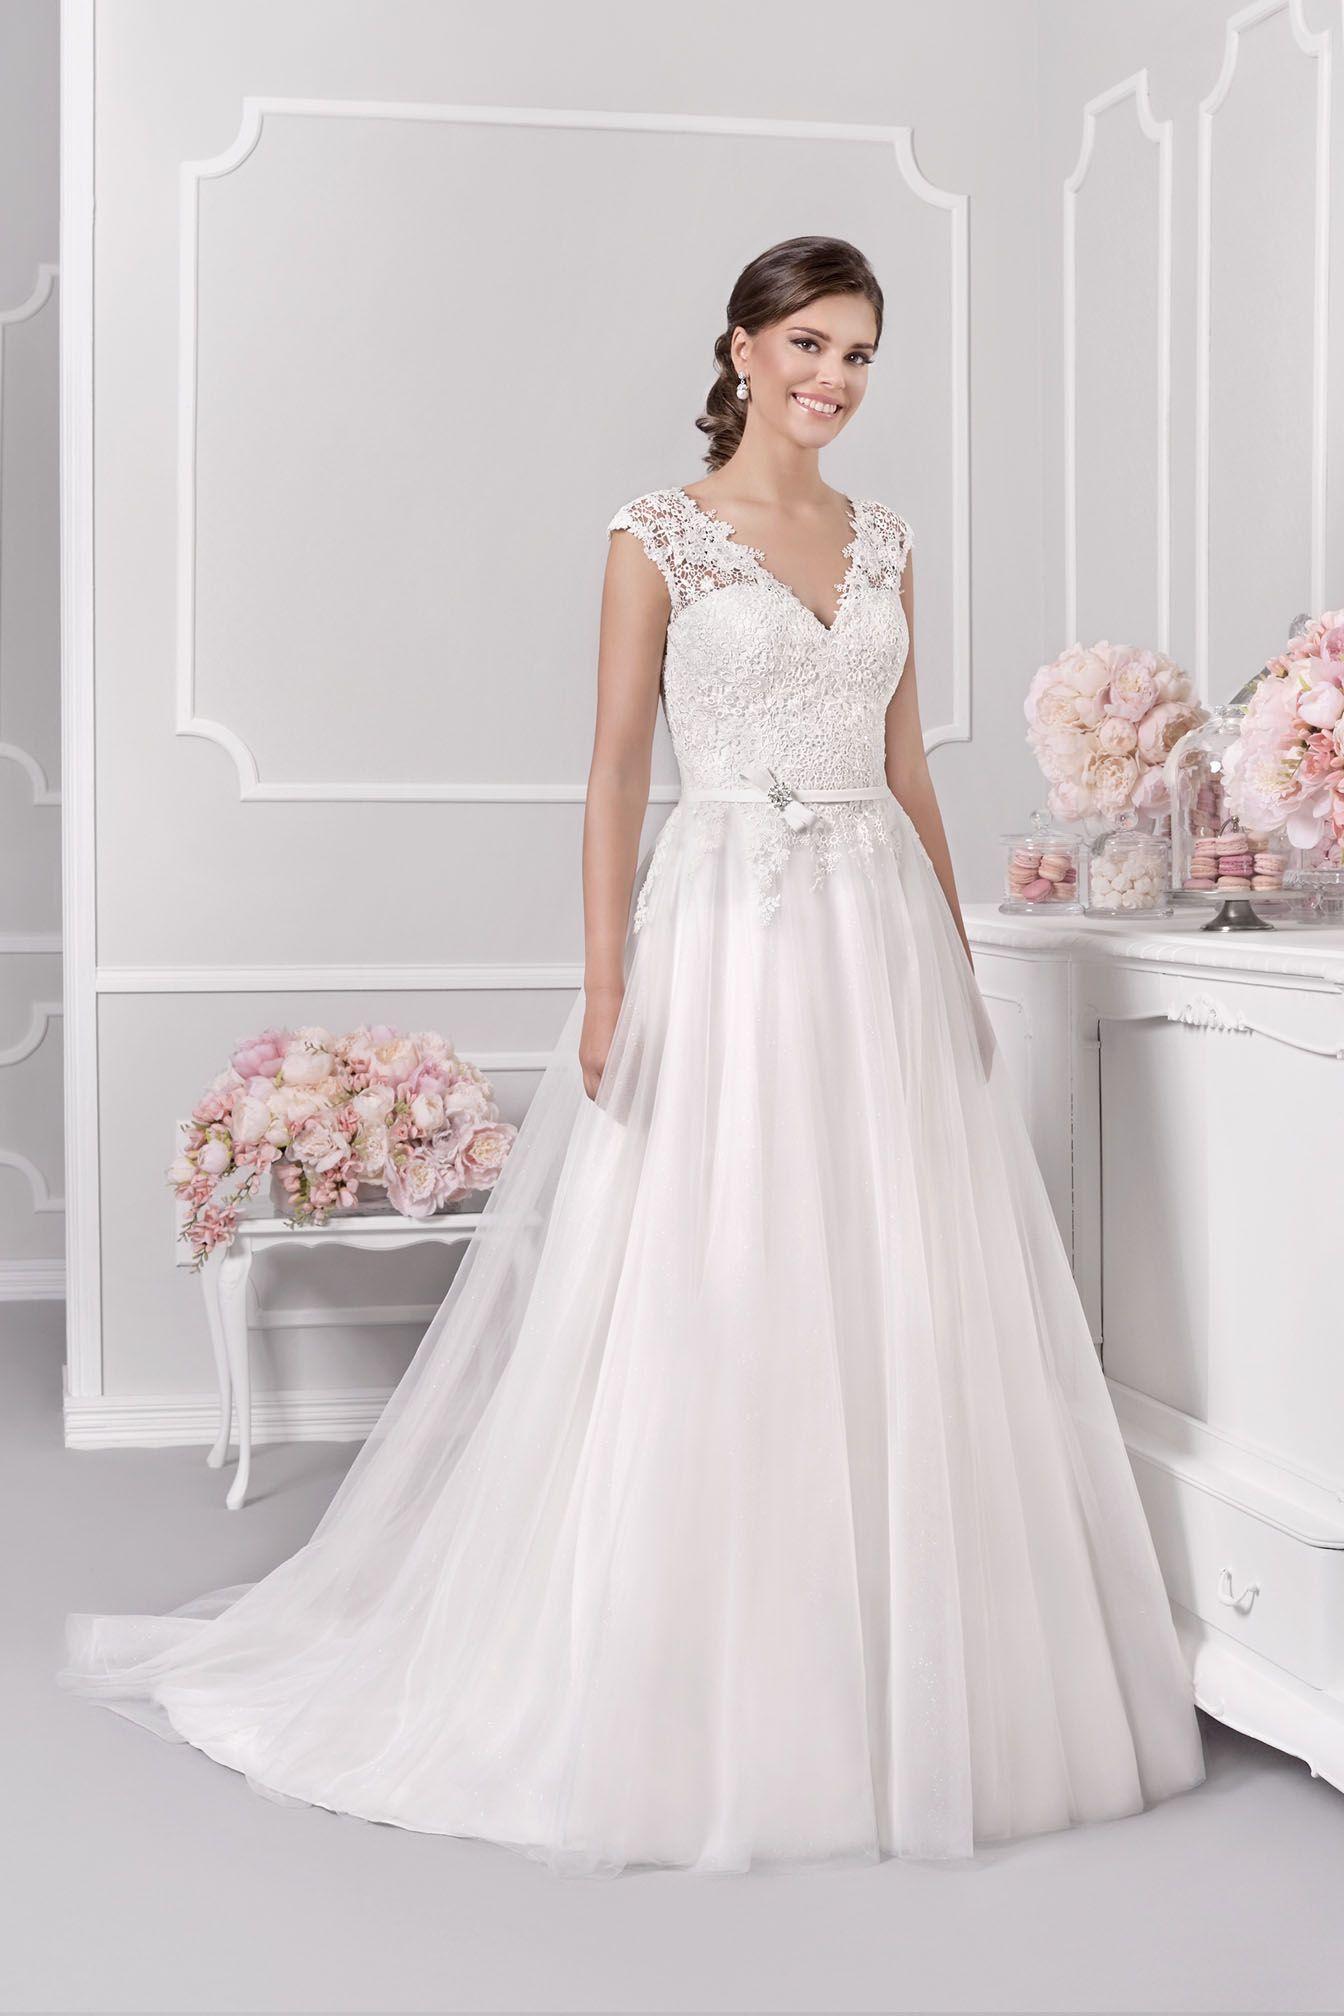 Off white short wedding dresses  T  Agnes Bridal Dream   Hochzeitskleid  Pinterest  Bridal